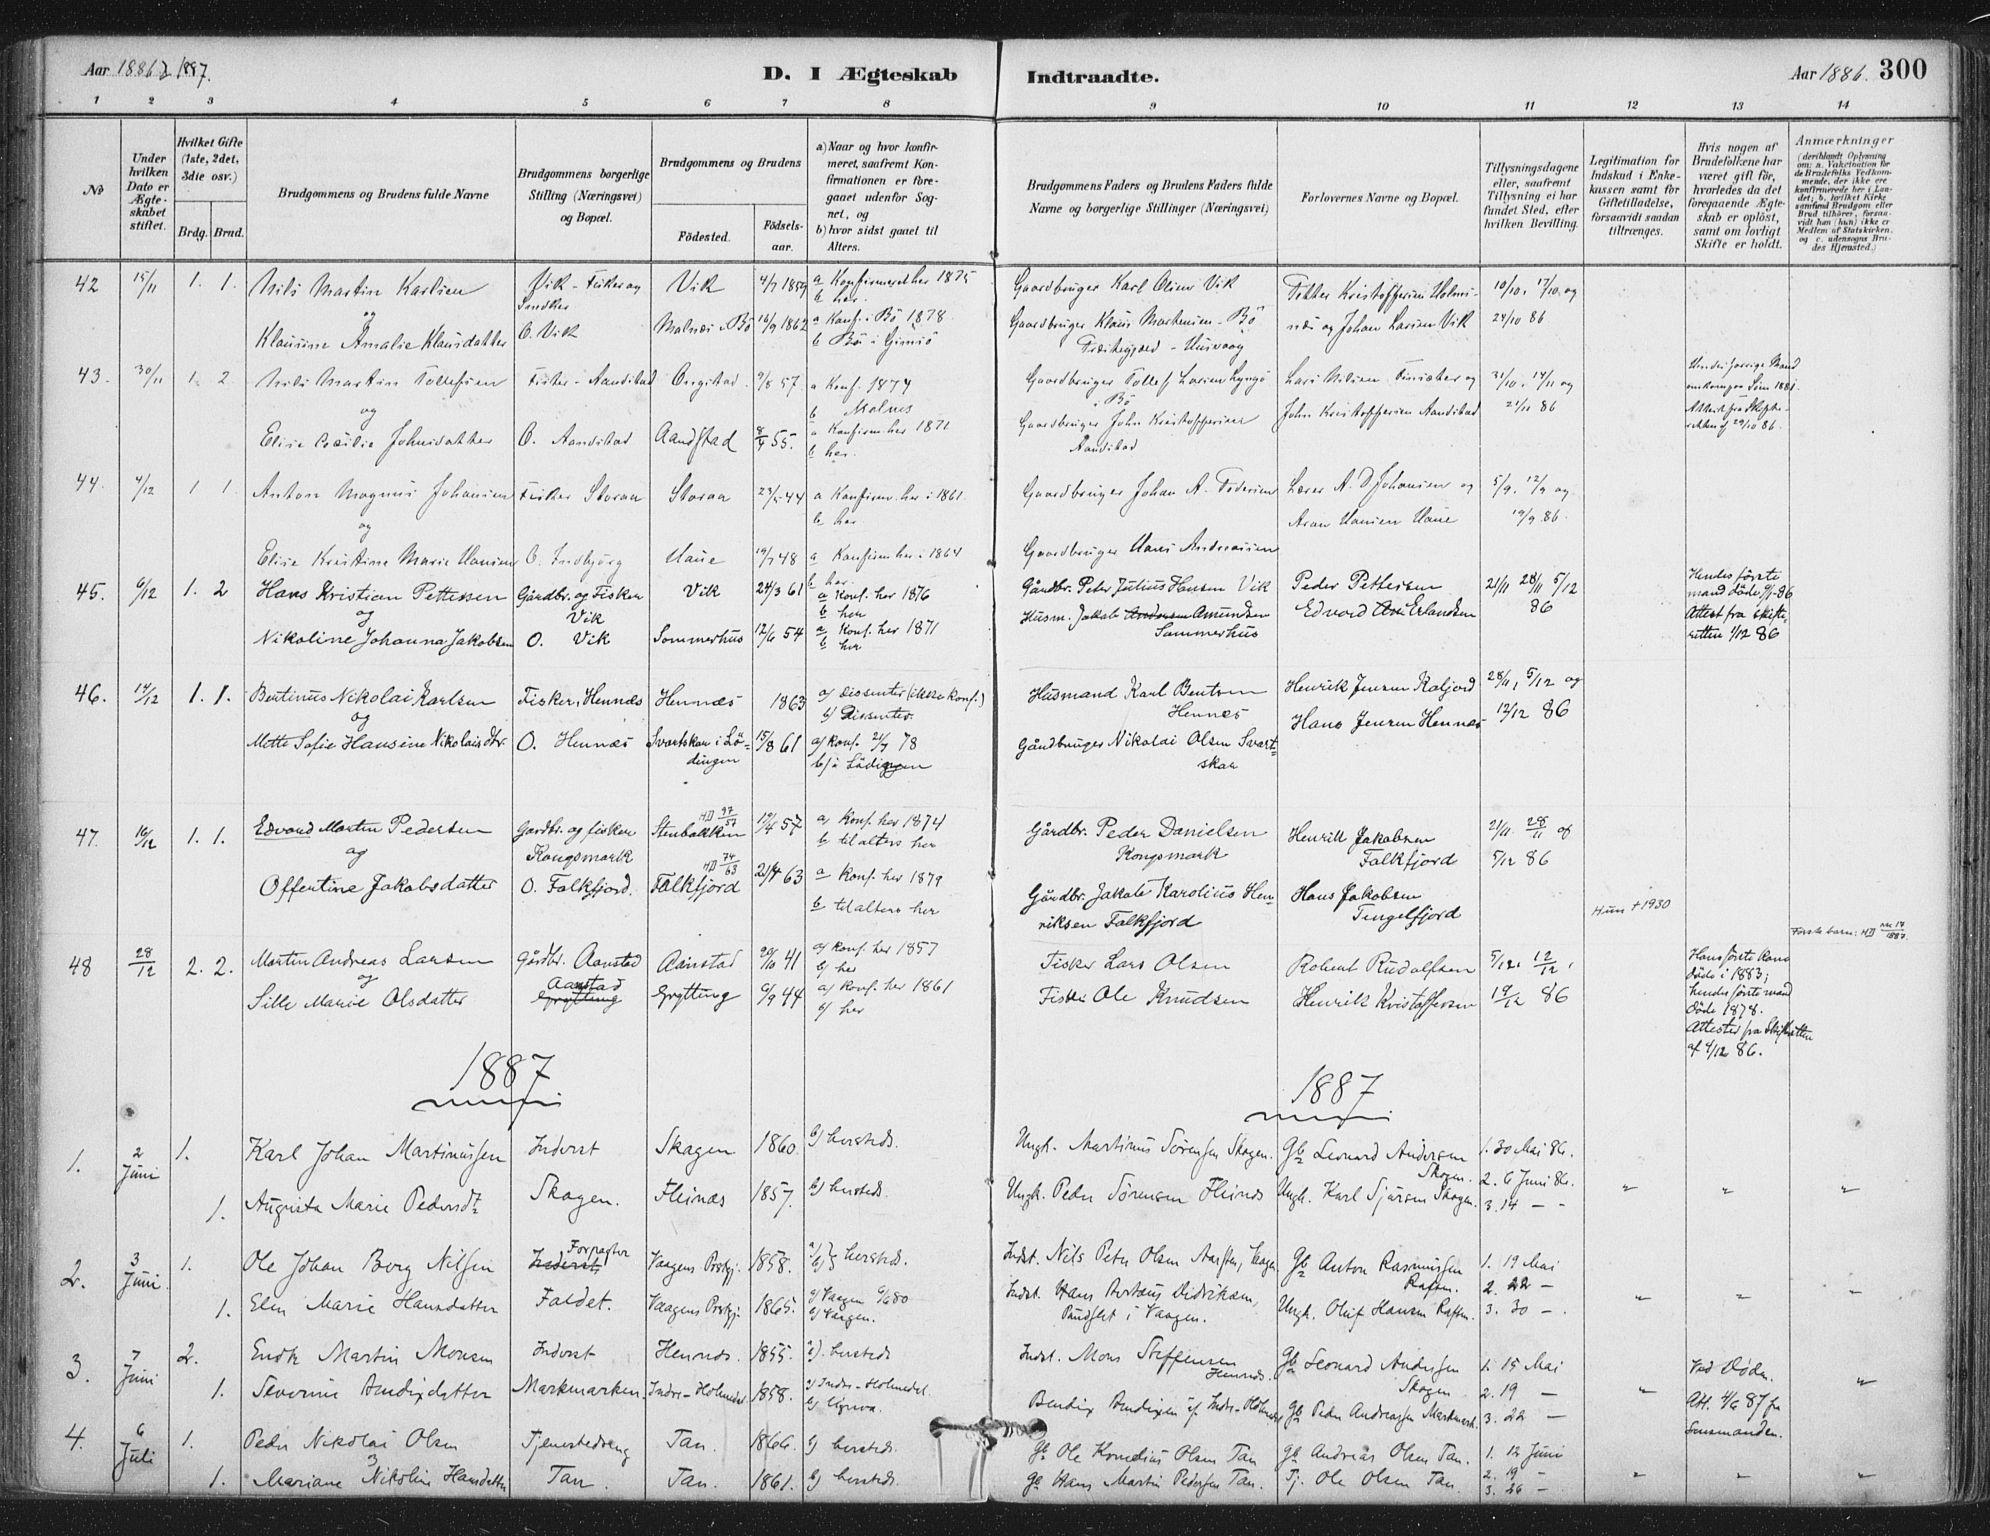 SAT, Ministerialprotokoller, klokkerbøker og fødselsregistre - Nordland, 888/L1244: Ministerialbok nr. 888A10, 1880-1890, s. 300